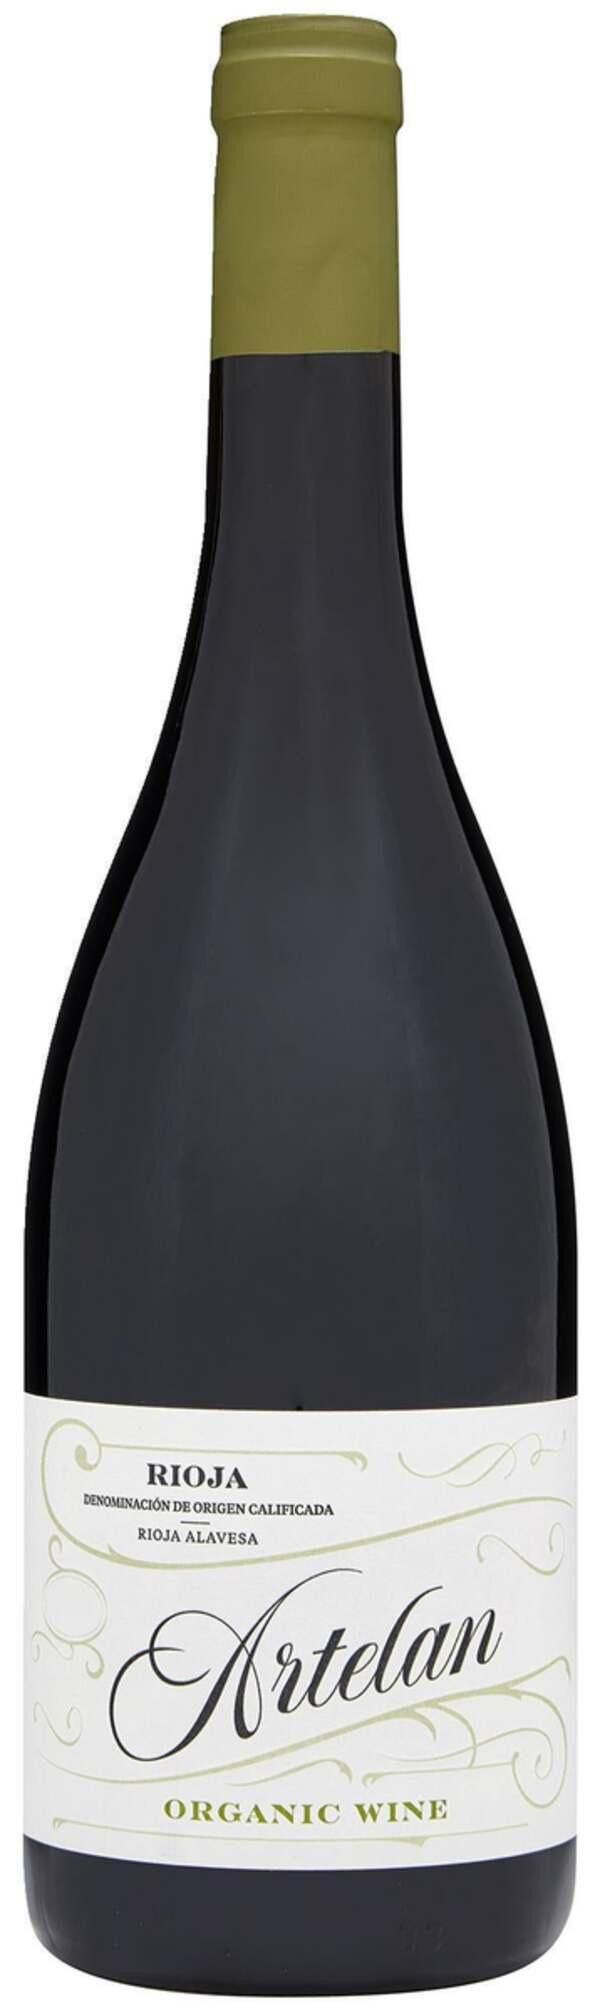 ARTELAN Rioja Tempranillo Tinto